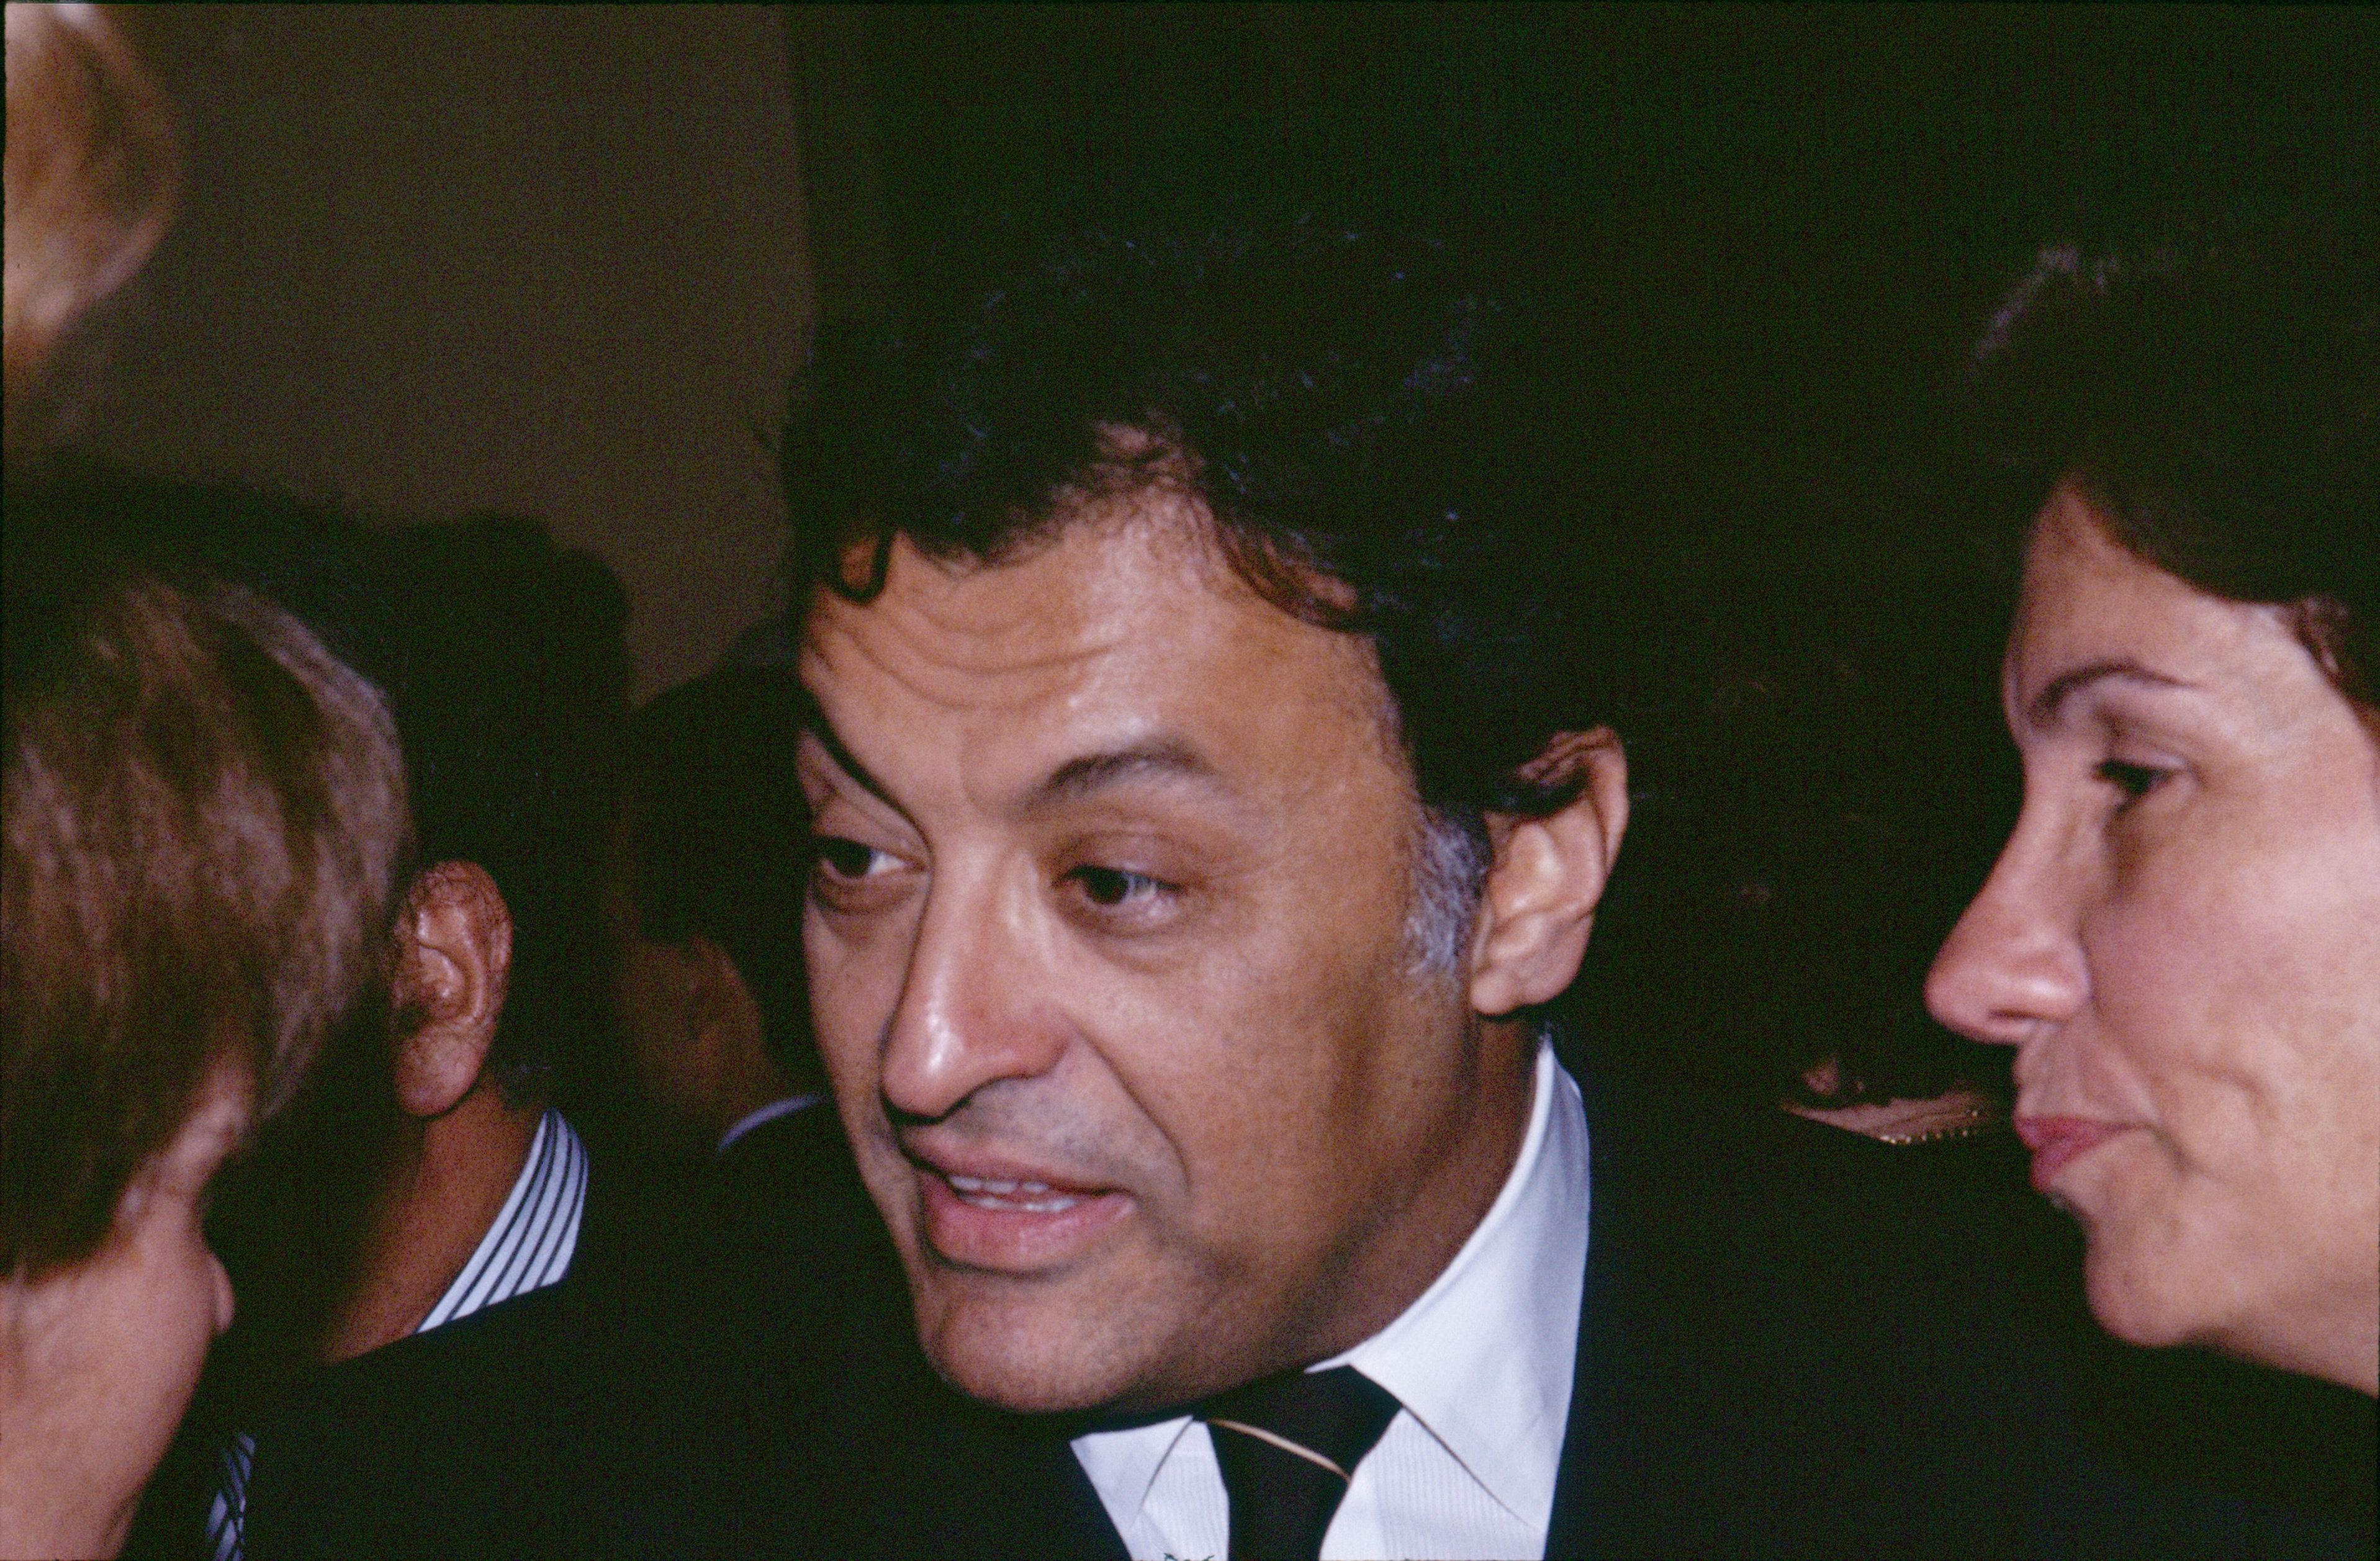 1986_12 (15) JAFFA Ambassade de France